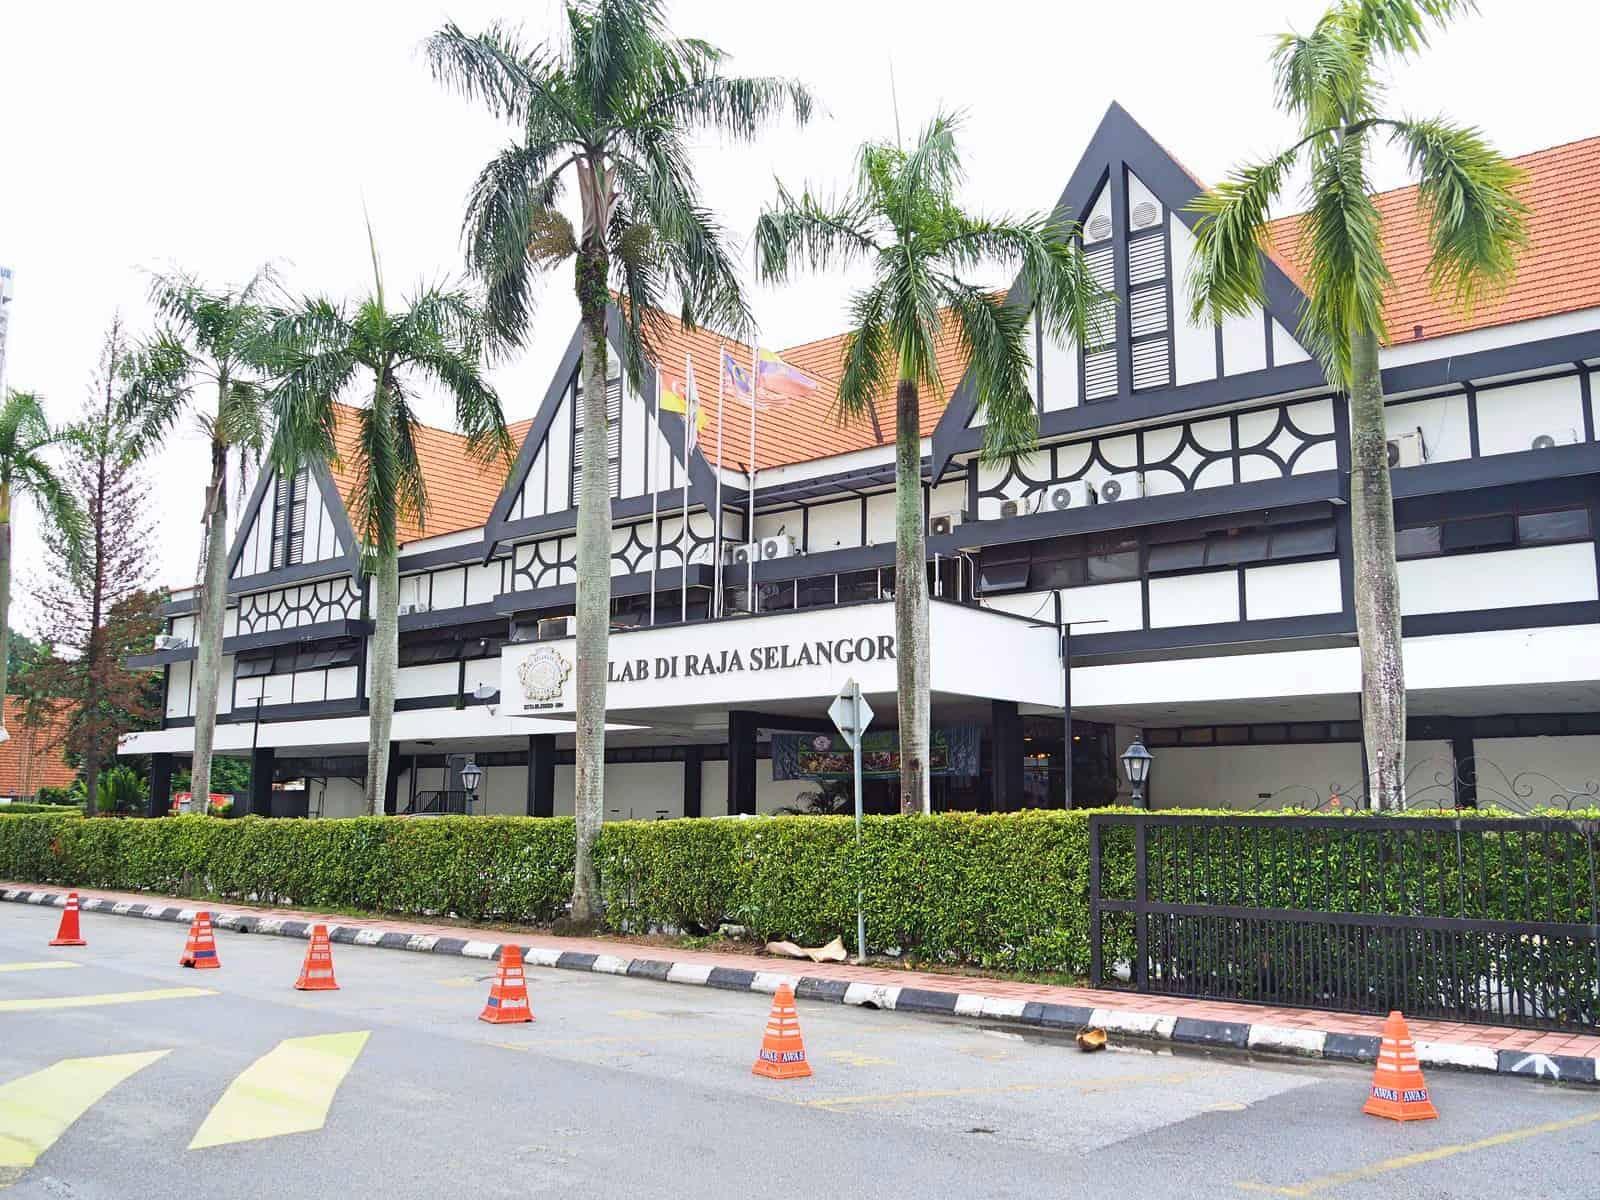 Royal-Selangor-Club-Merdeka-Square-Kuala Lumpur-Malaysia-Travel-Mermaid